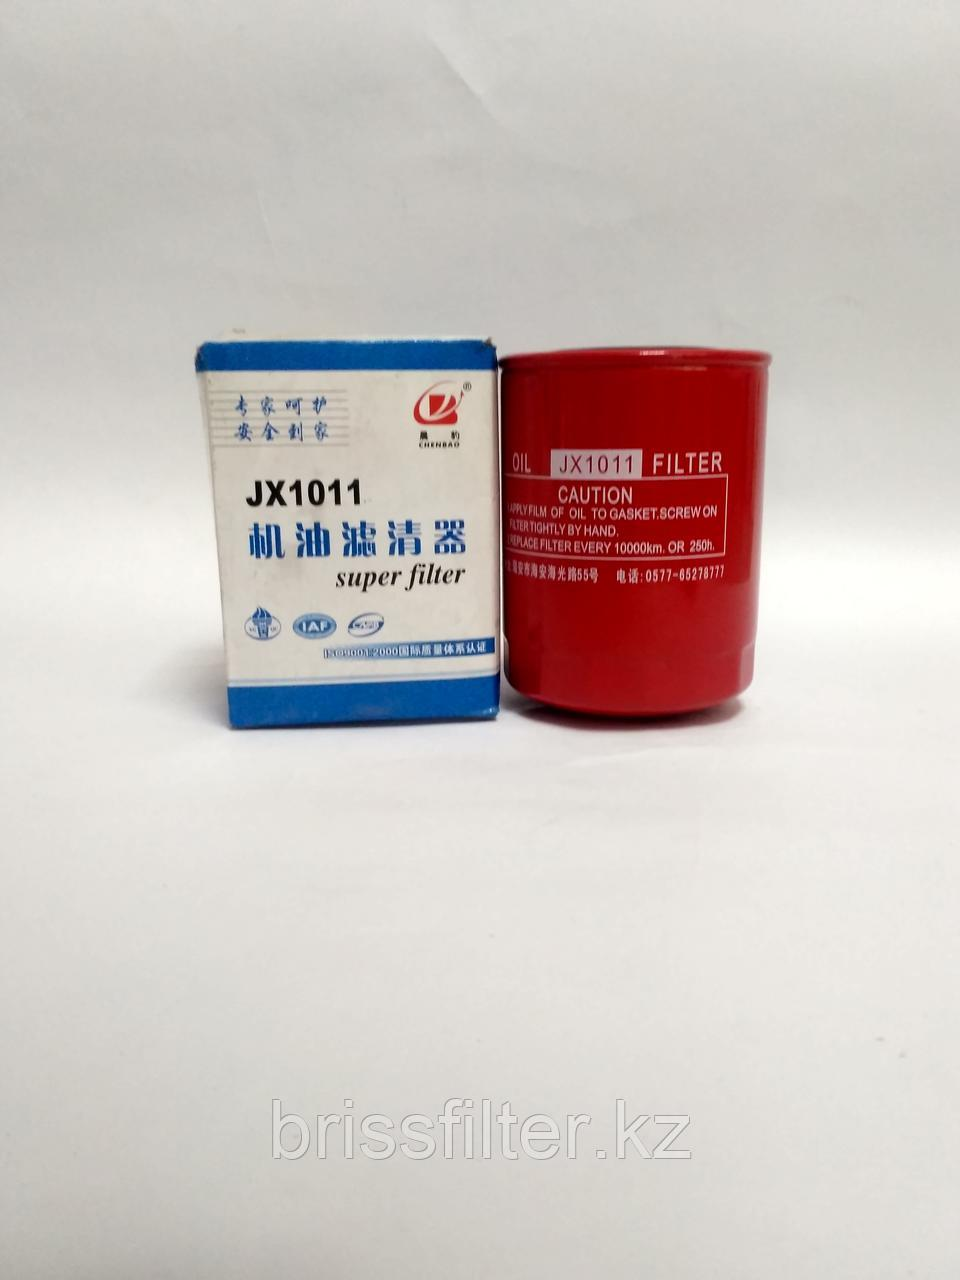 JX 1011